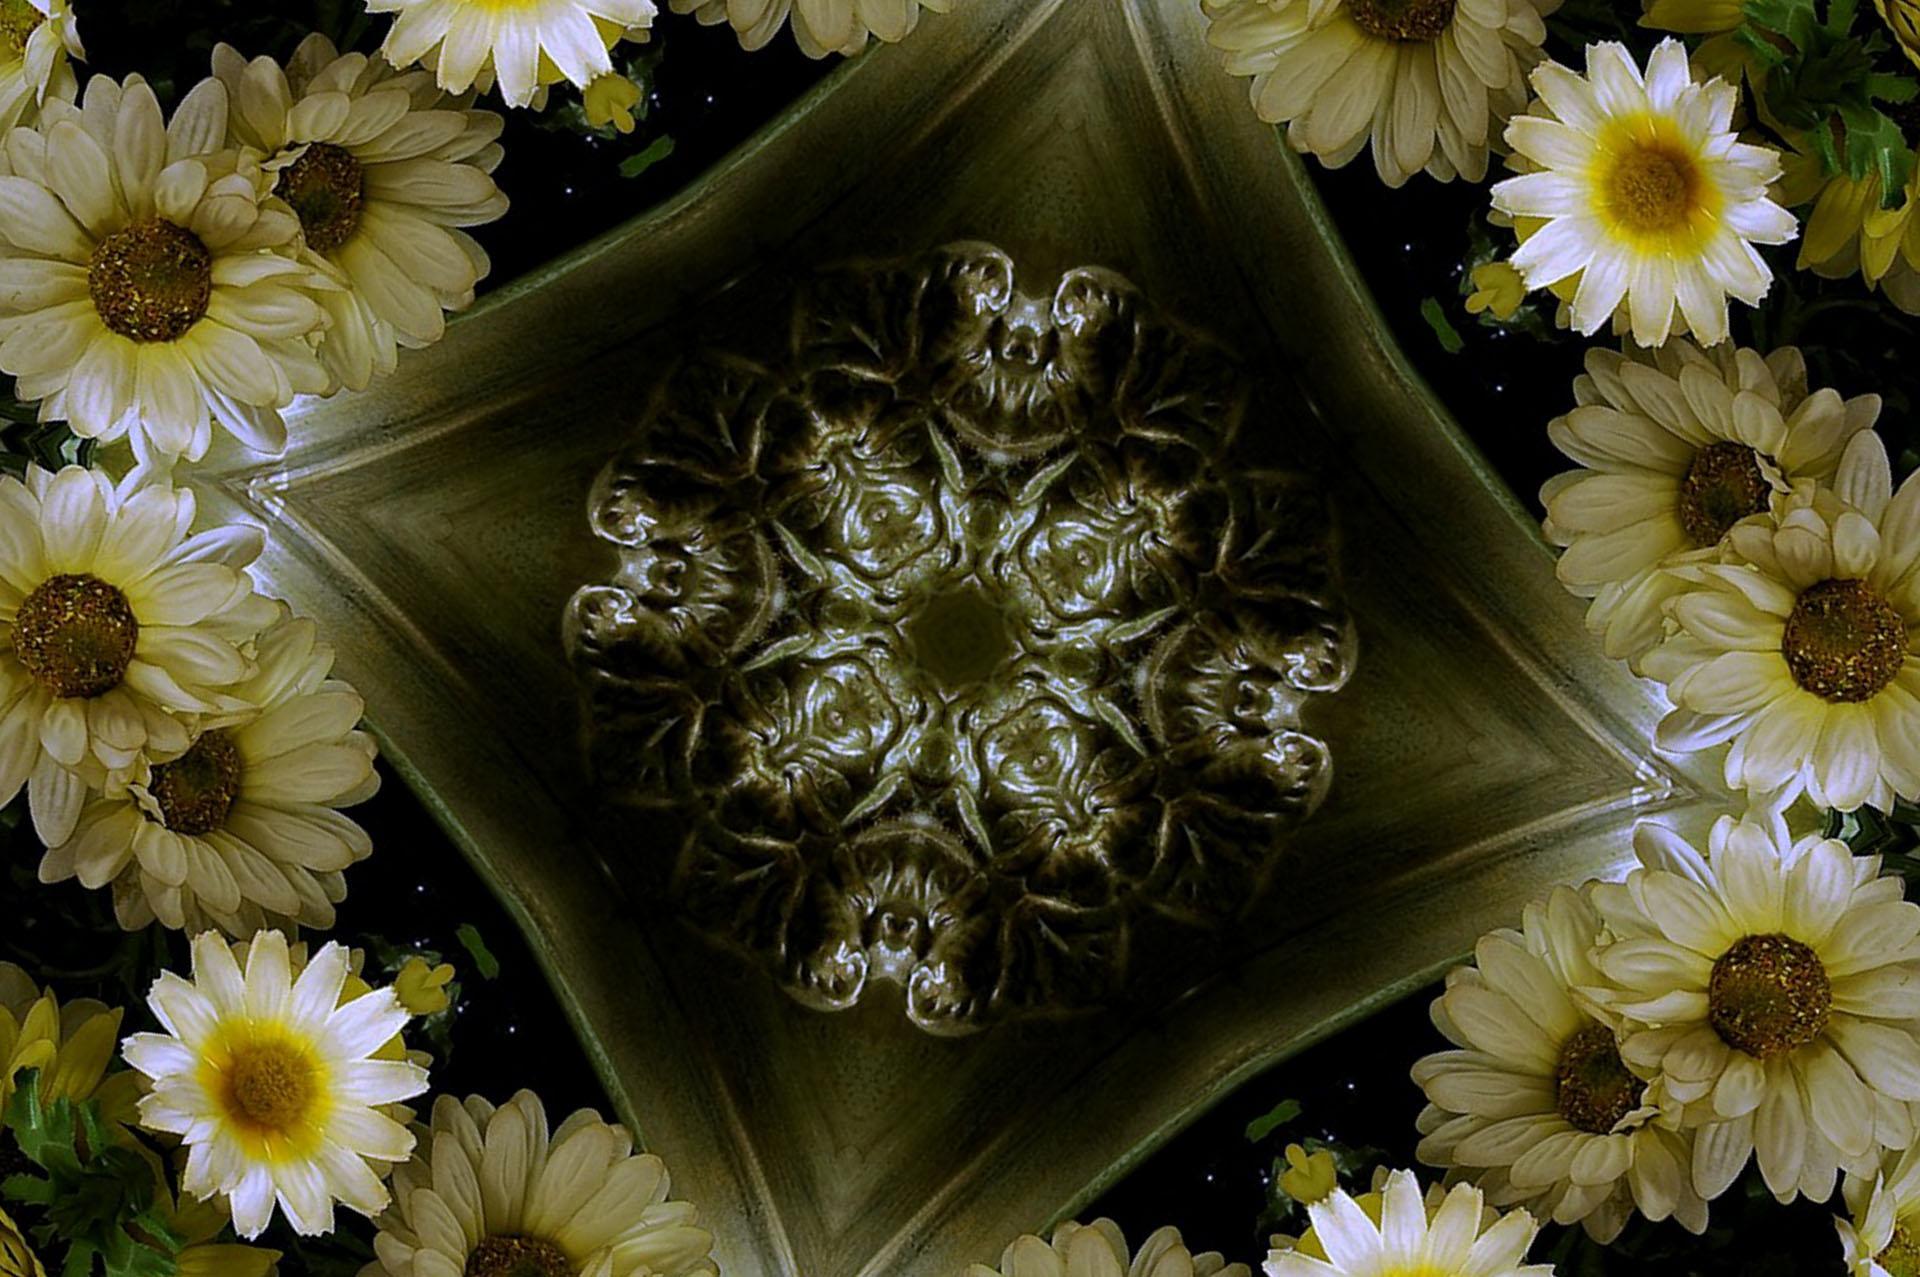 Digital Art Flower 1920x1277